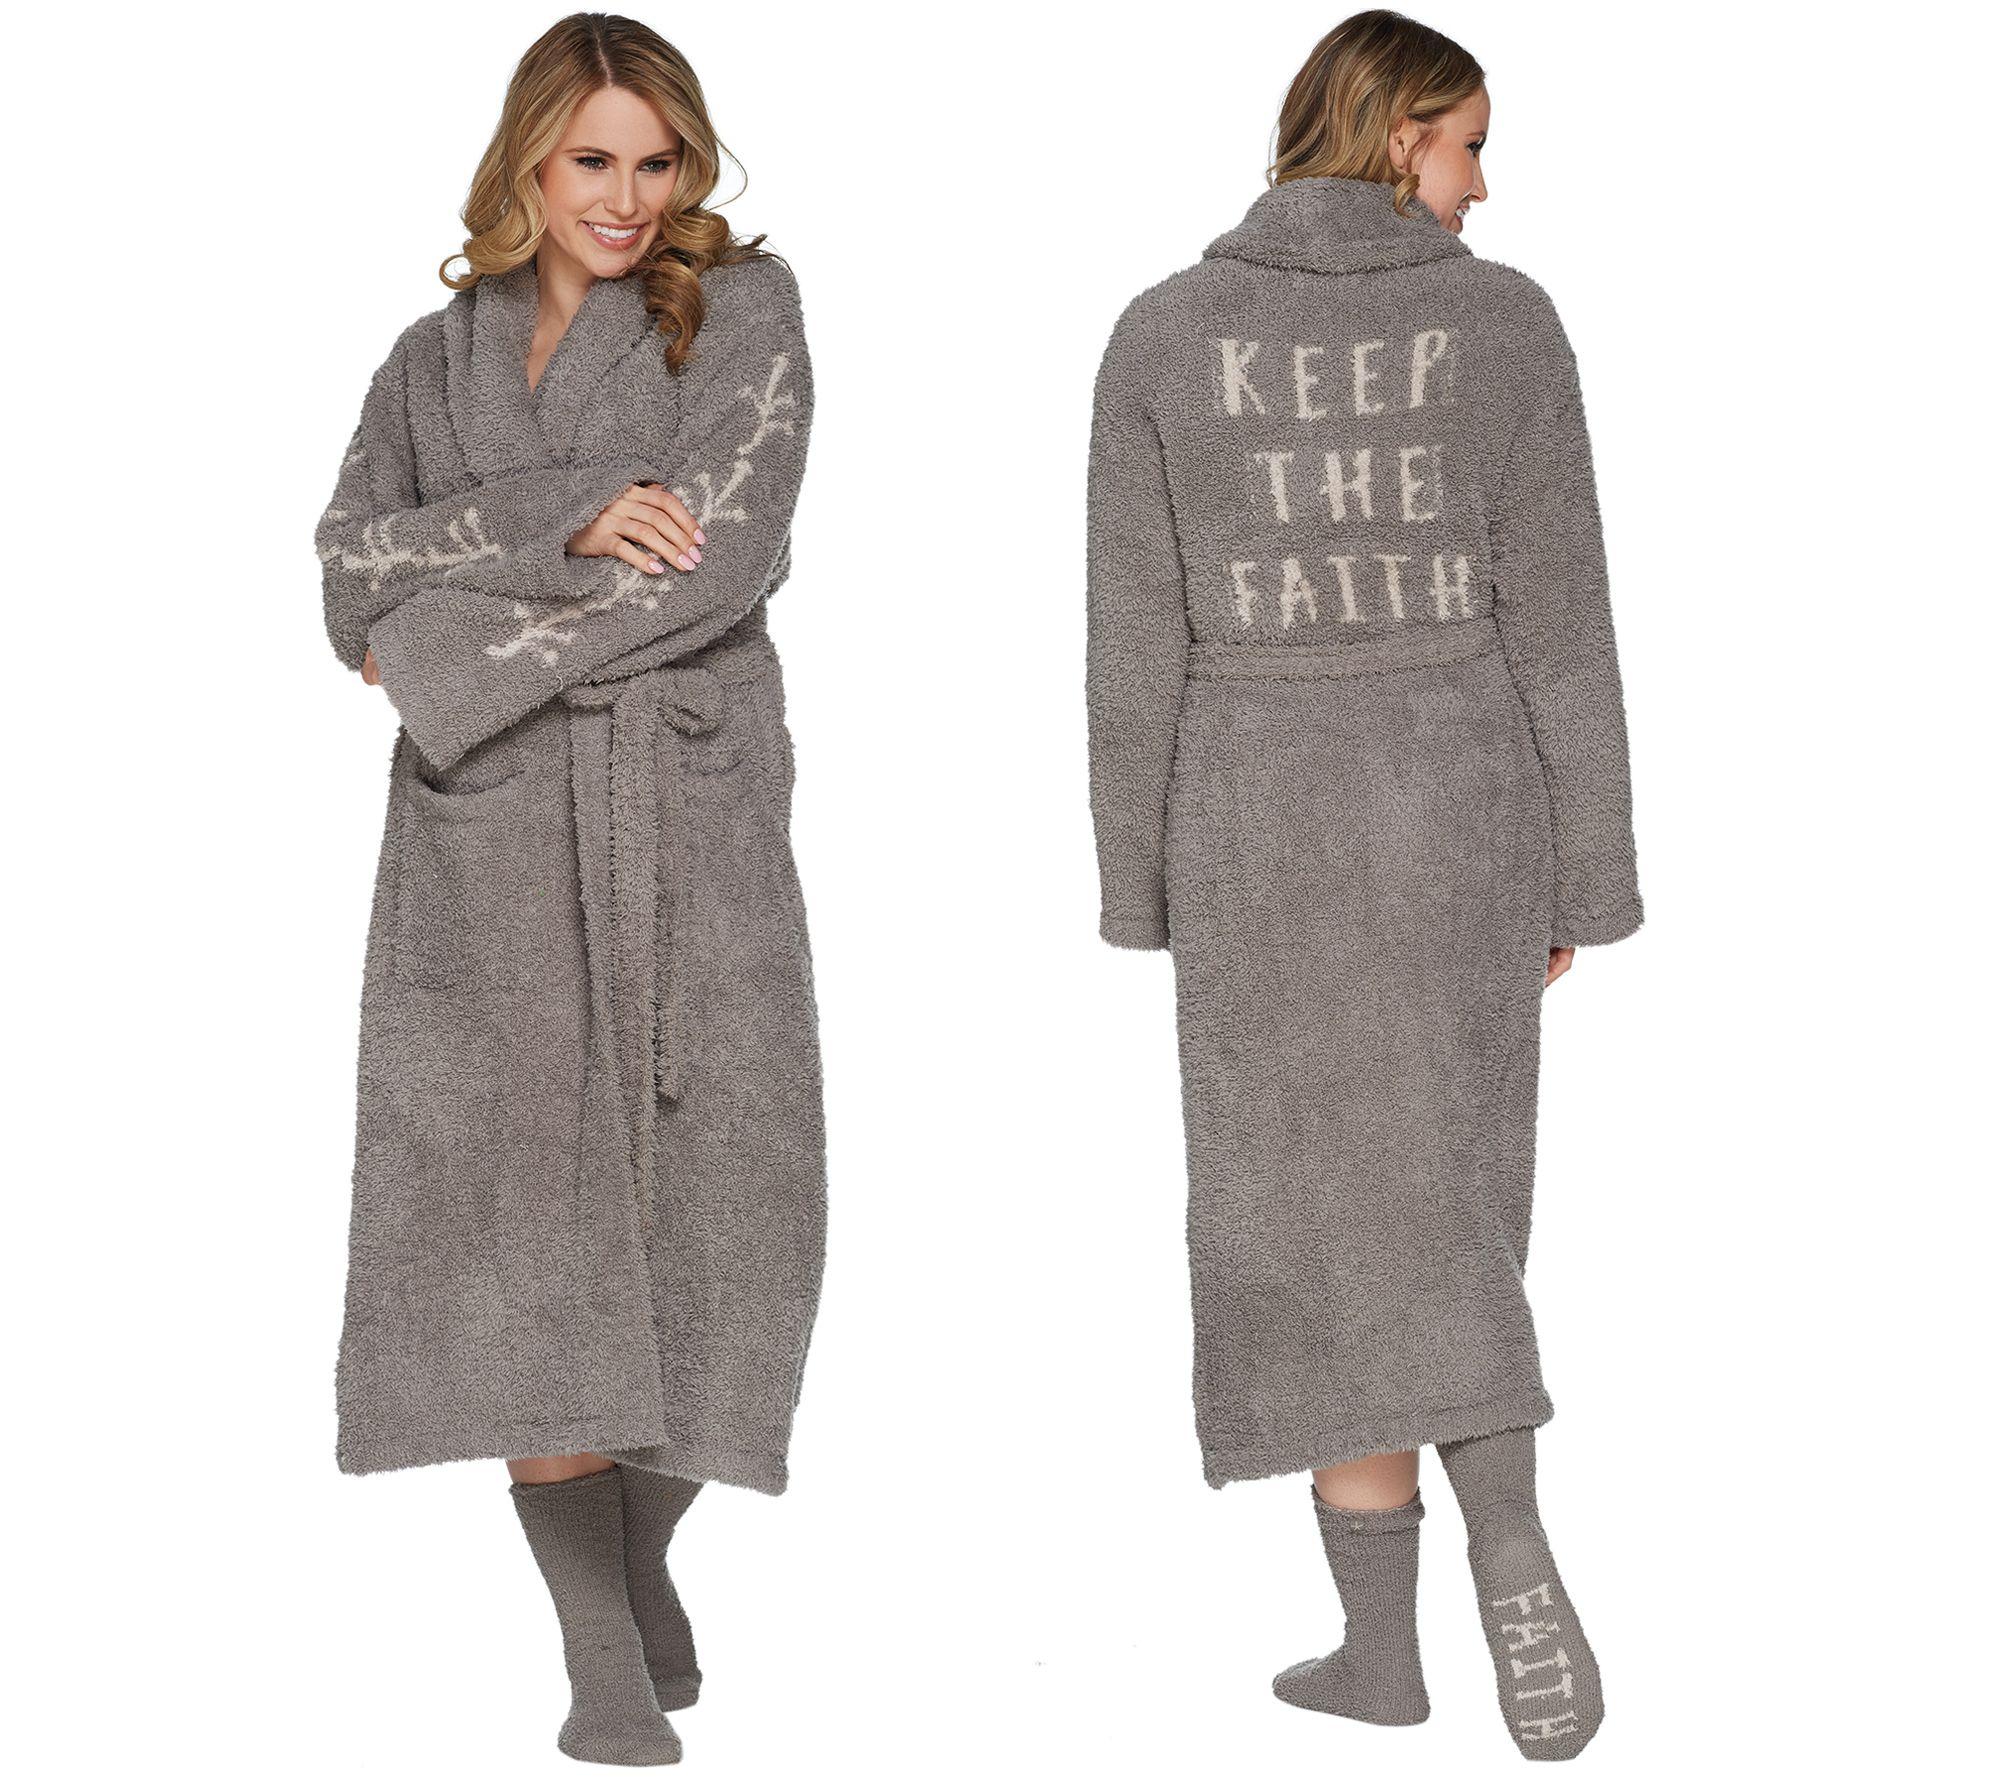 69f1e2a536 Barefoot Dreams Cozychic Inspiration Robe with Socks - Page 1 — QVC.com